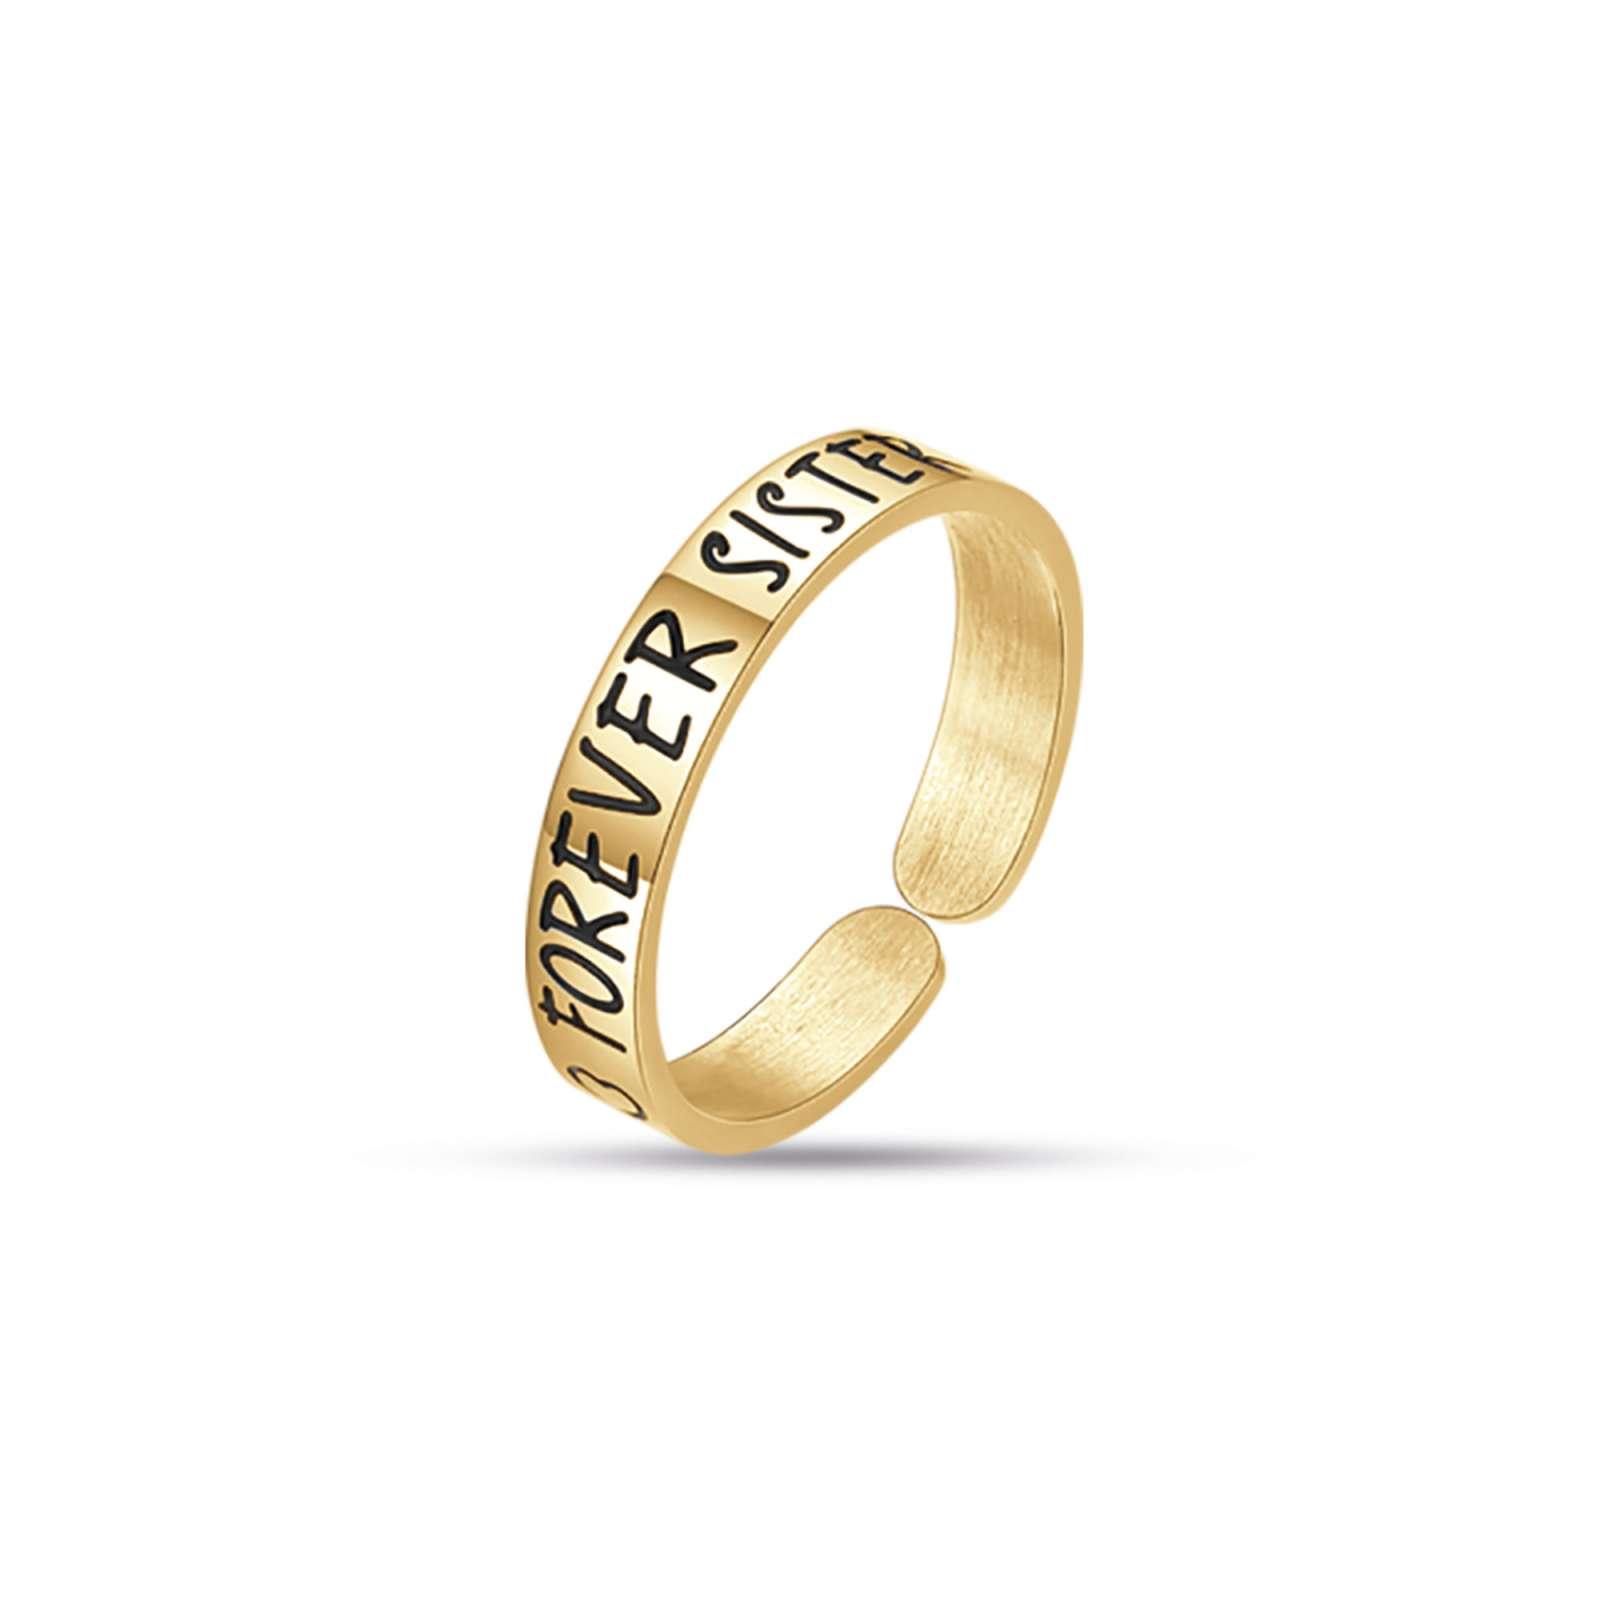 Luca Barra - Anello in acciaio gold forever sister